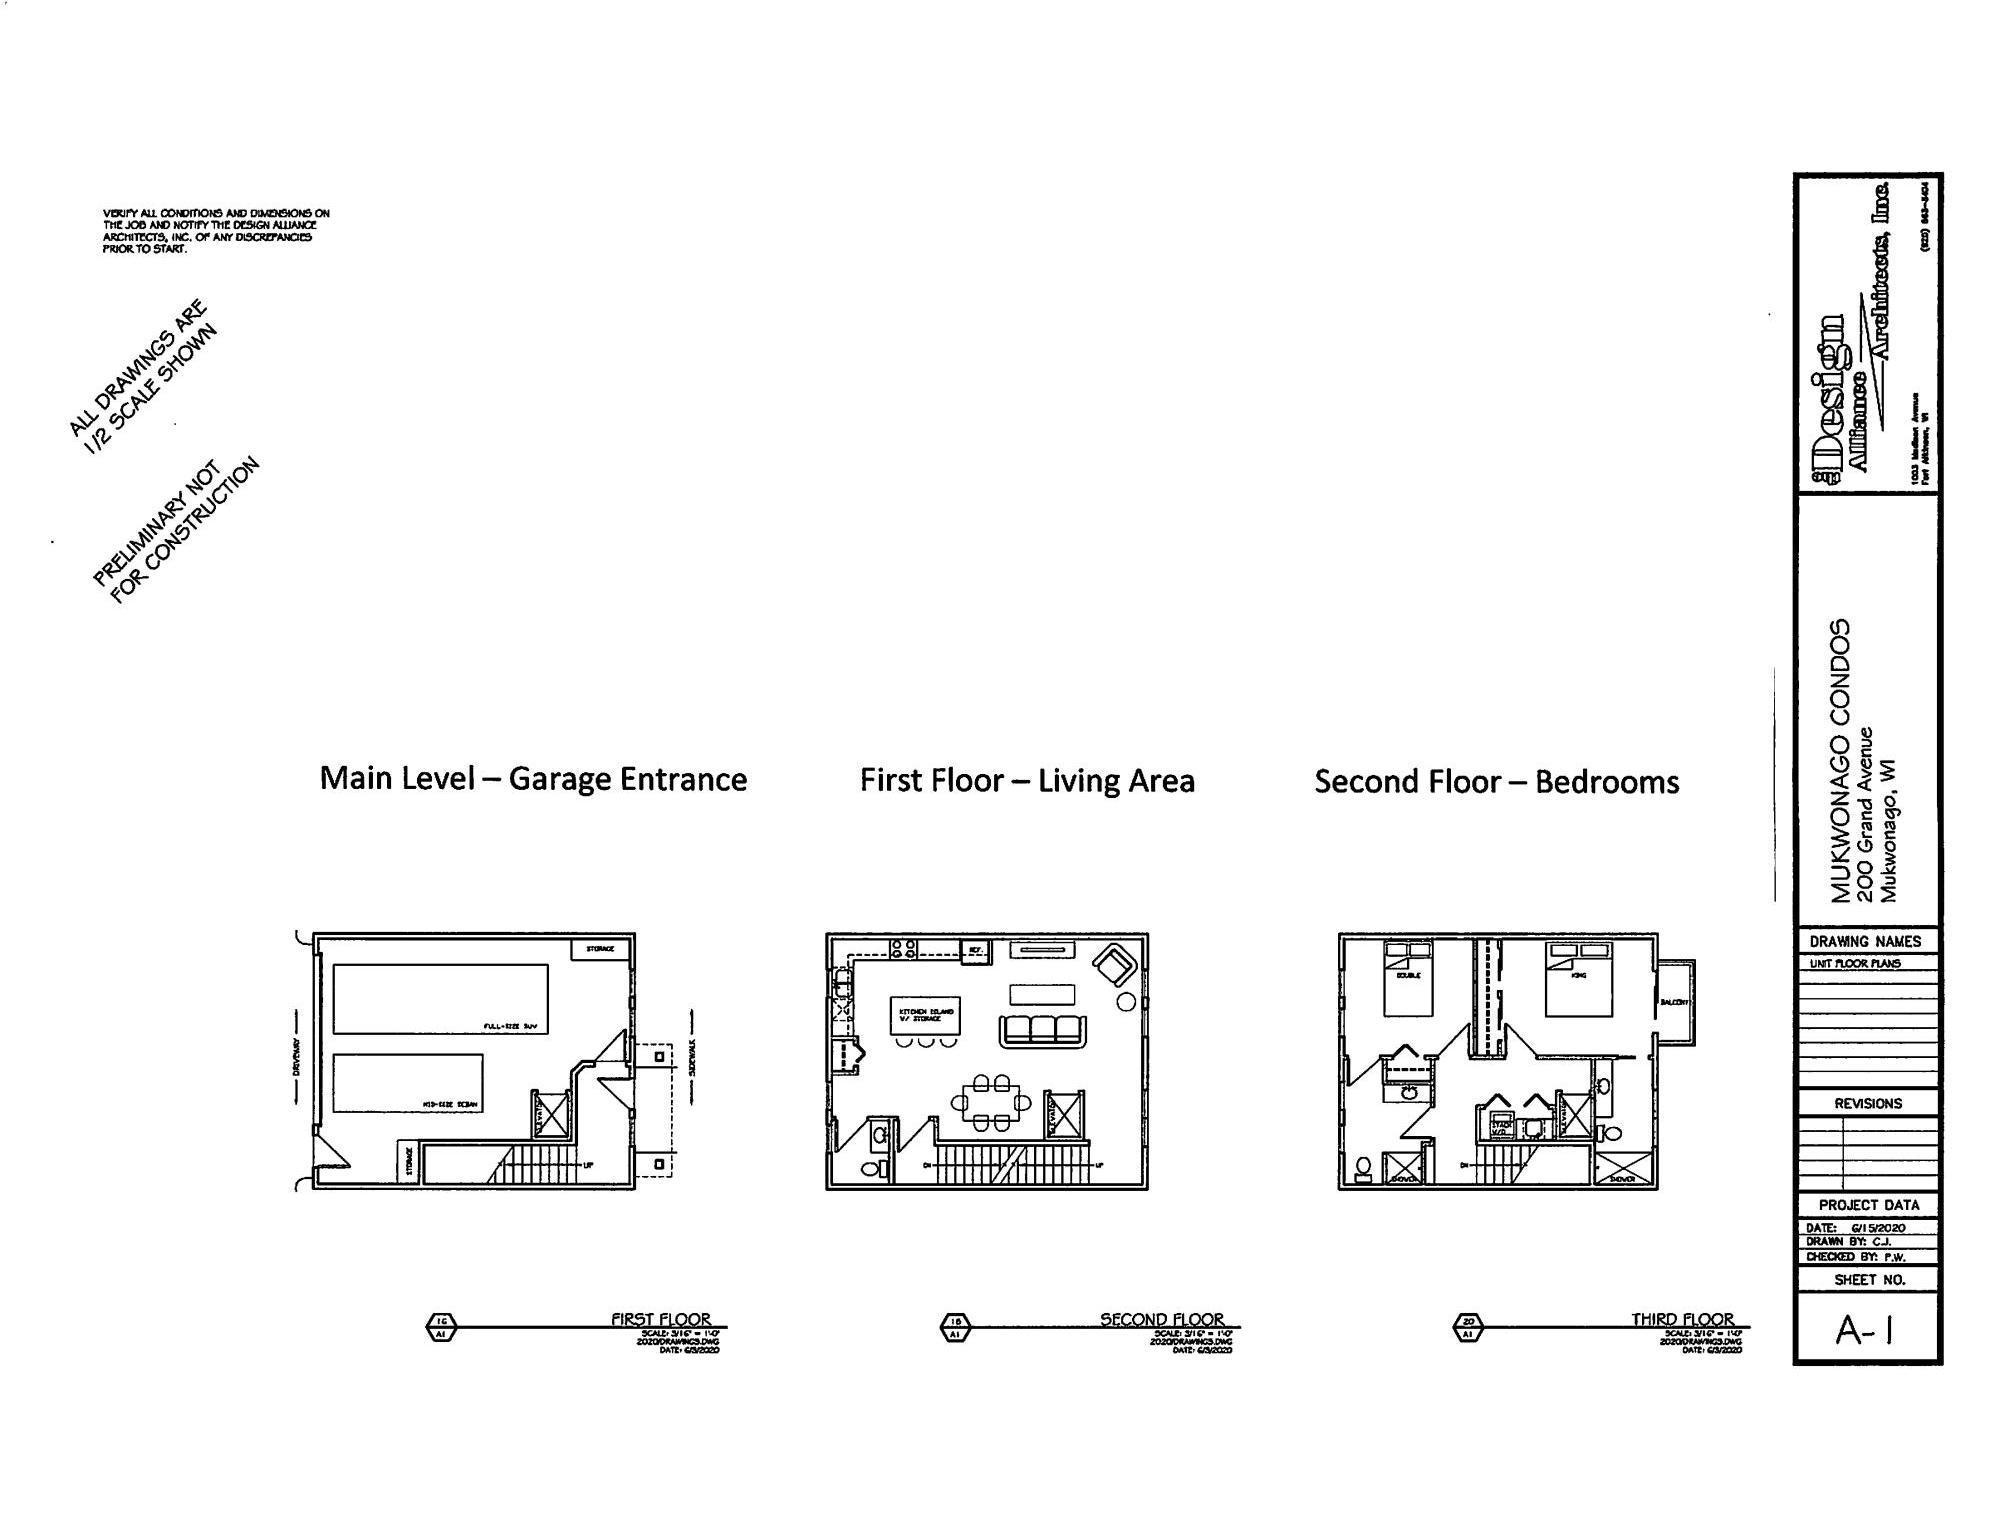 200 Grand Ave, Mukwonago, Wisconsin 53149, 2 Bedrooms Bedrooms, ,2 BathroomsBathrooms,Condominium,For Sale,Grand Ave,1695816